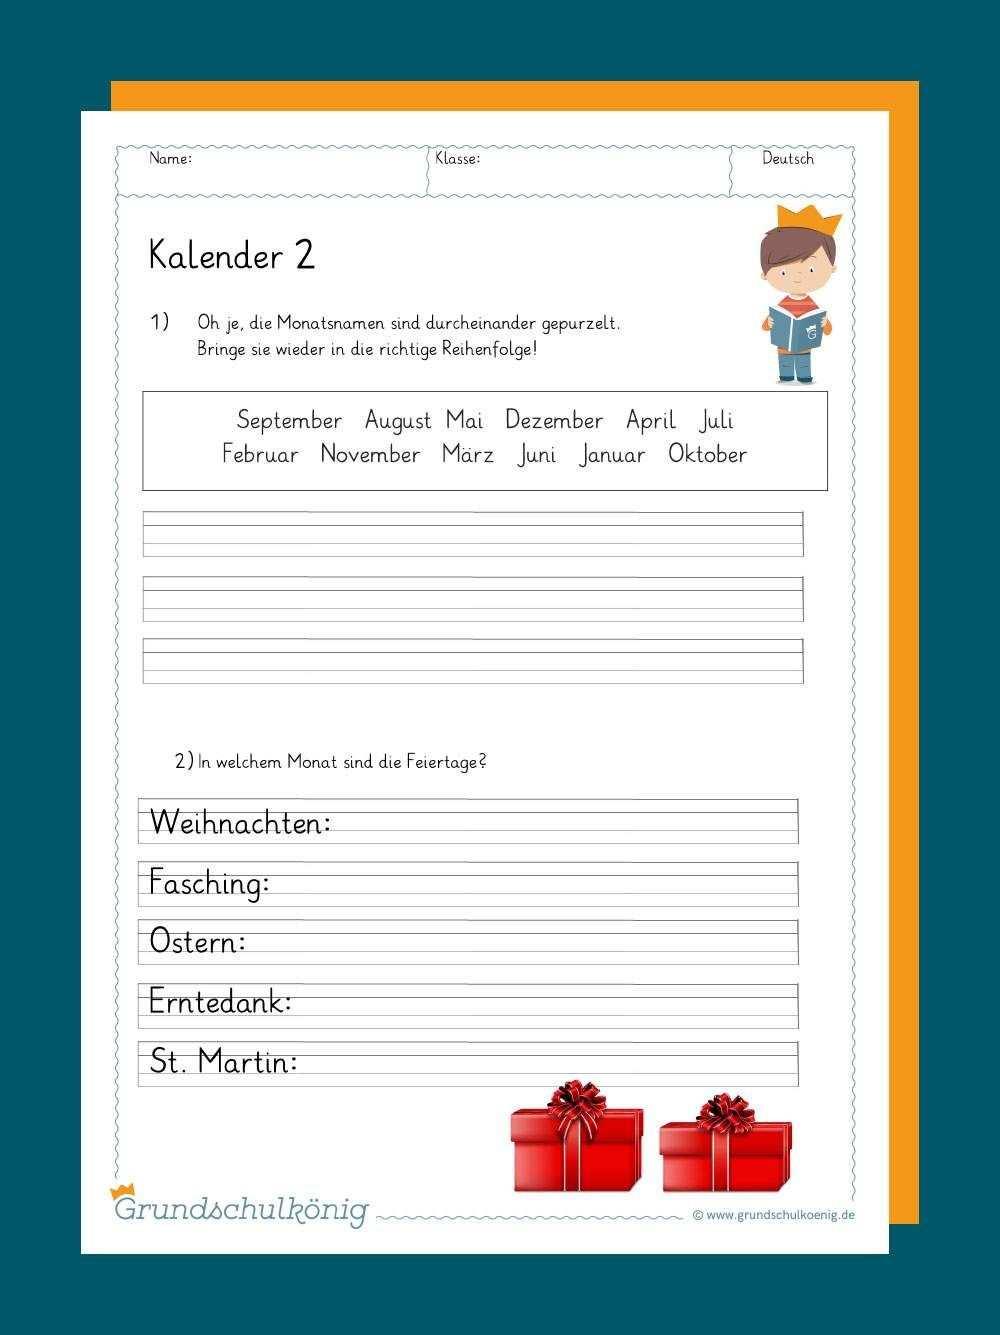 Kalender In 2020 Kalender Lernen Grundschulkonig